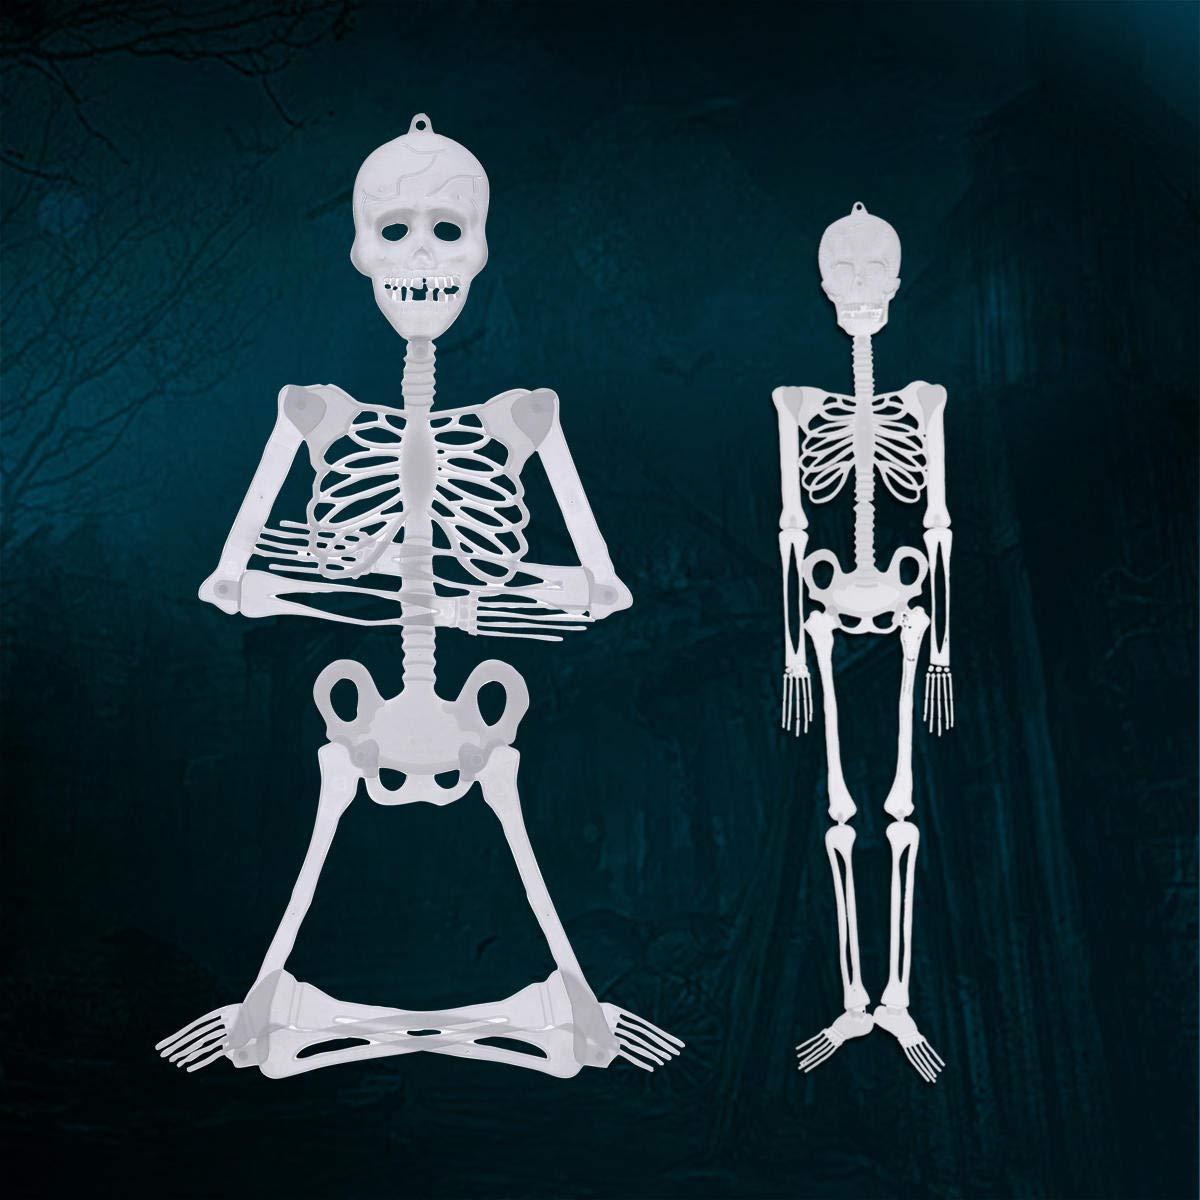 Halloween Luminou Human Skeleton Decoration Classroom Occasionally Adjustable - 1PCs by Unknown (Image #2)